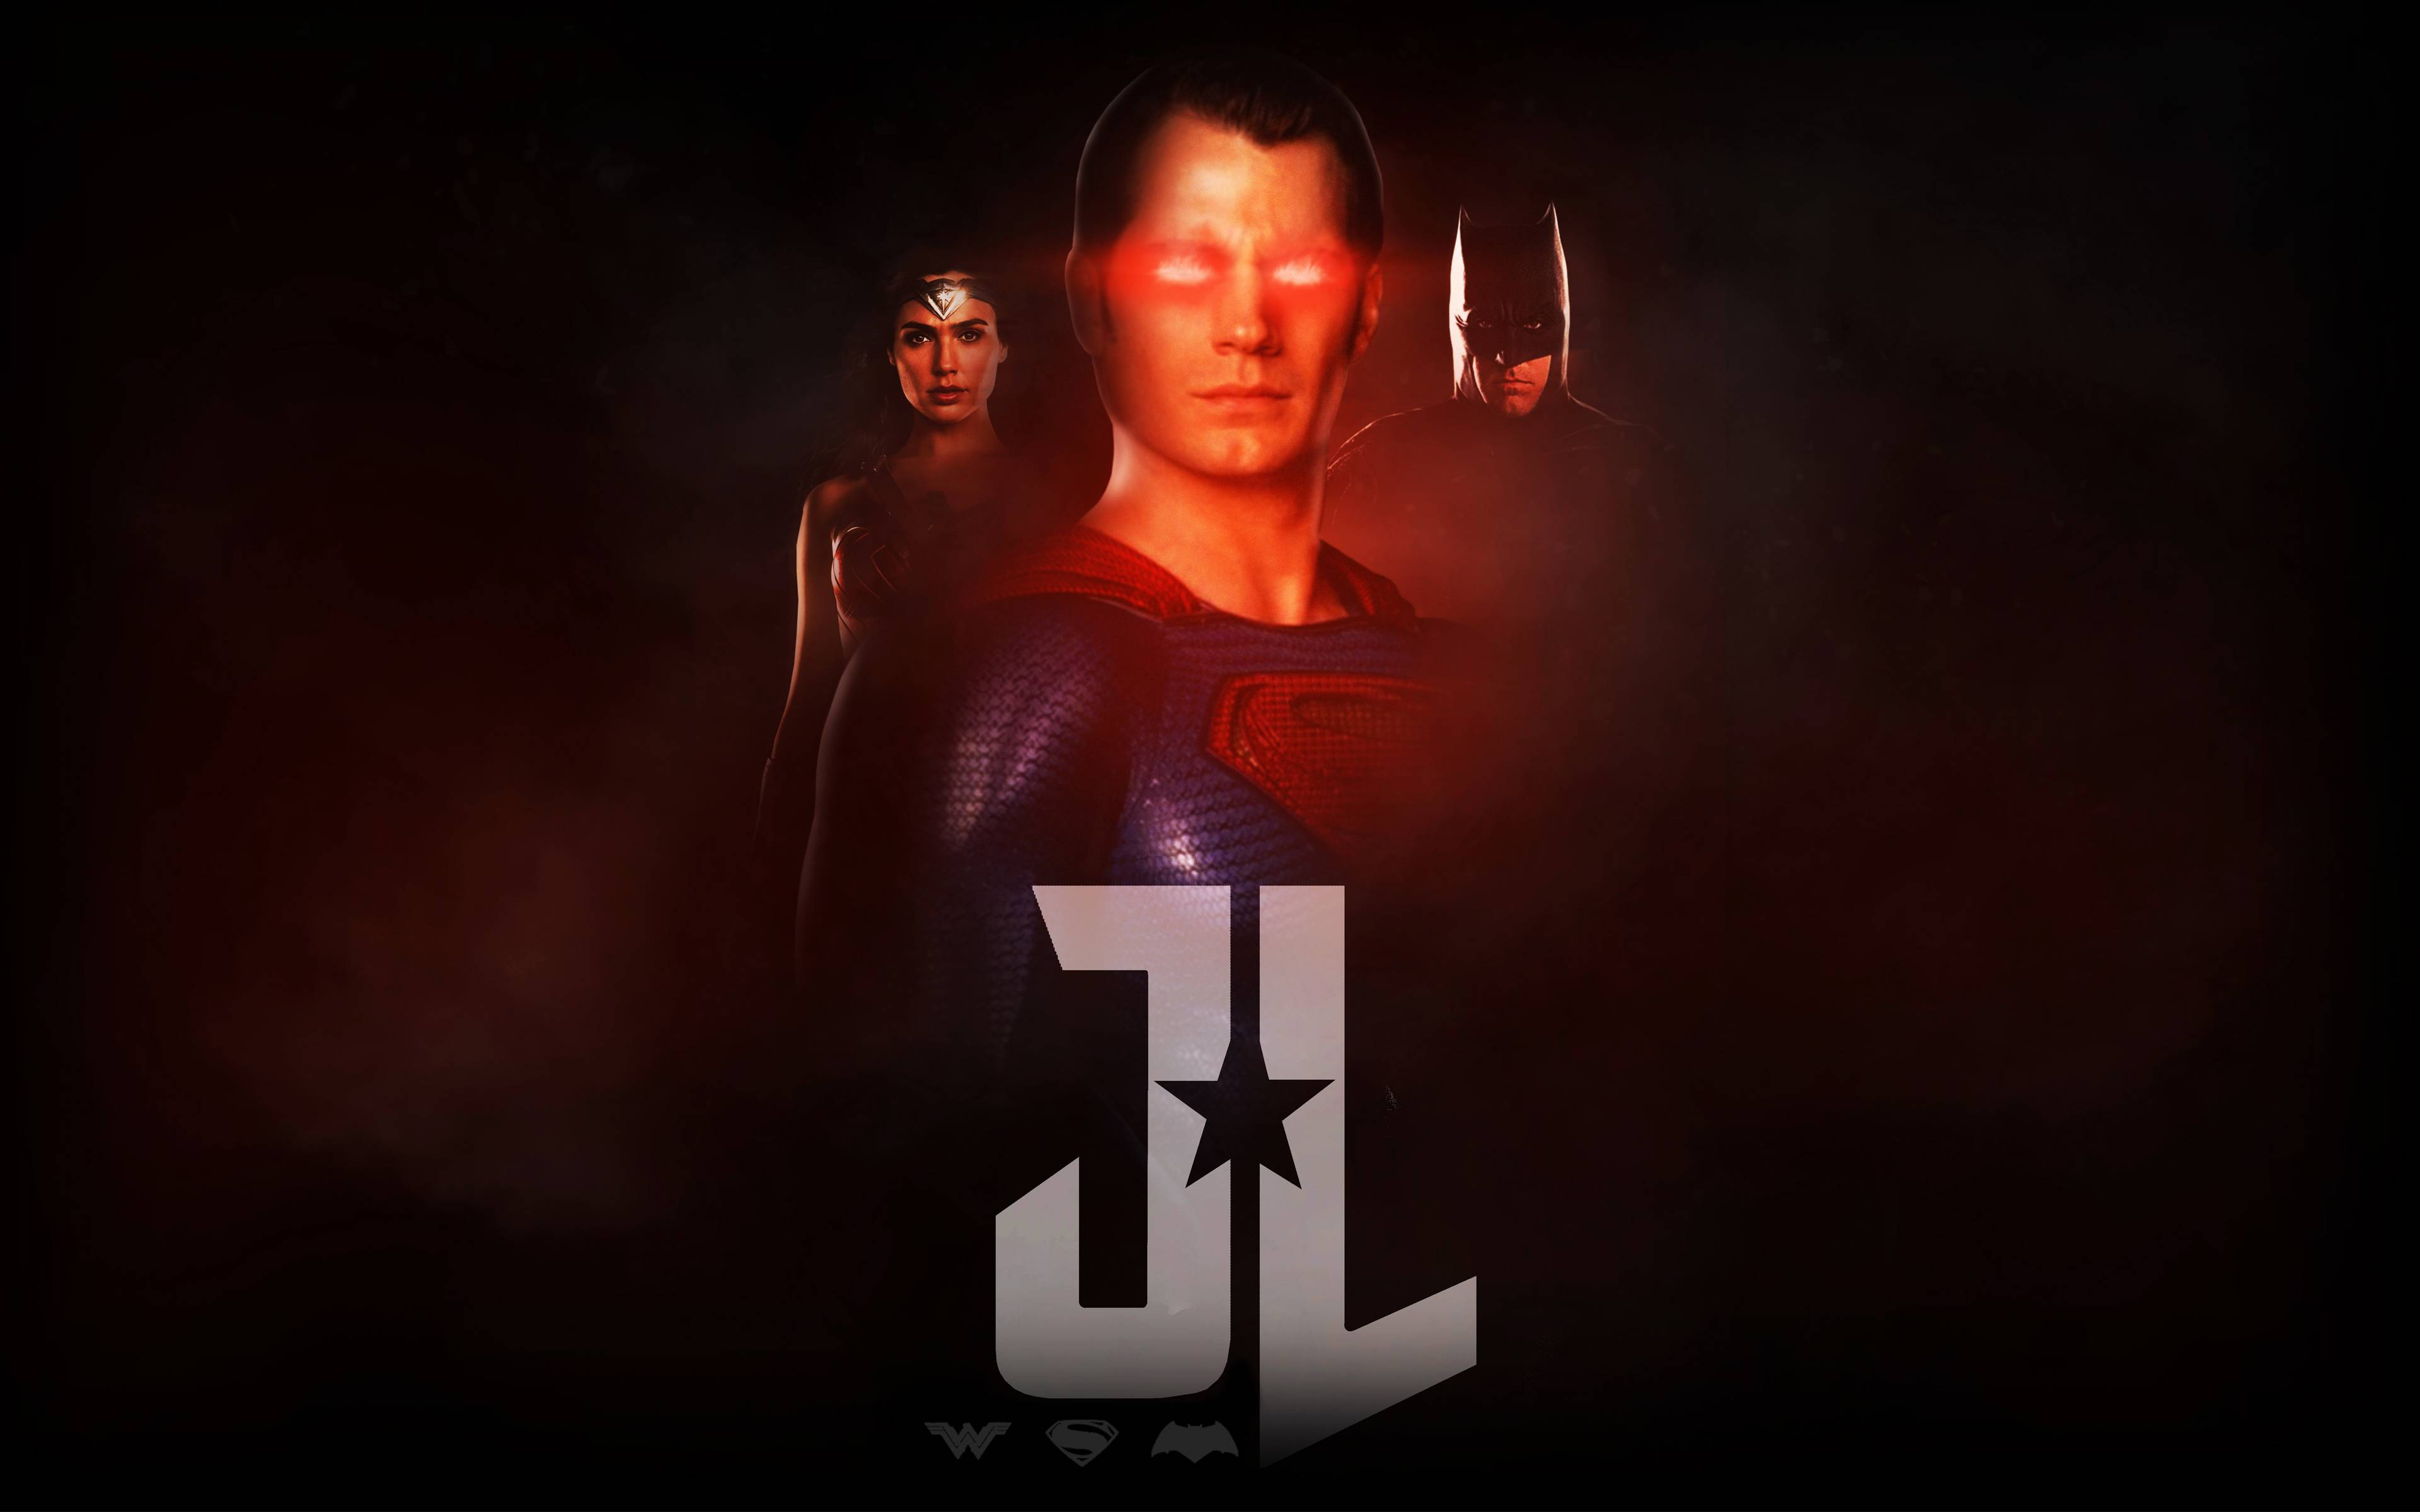 Justice League Wonder Woman Superman Batman 4k Wallpaper